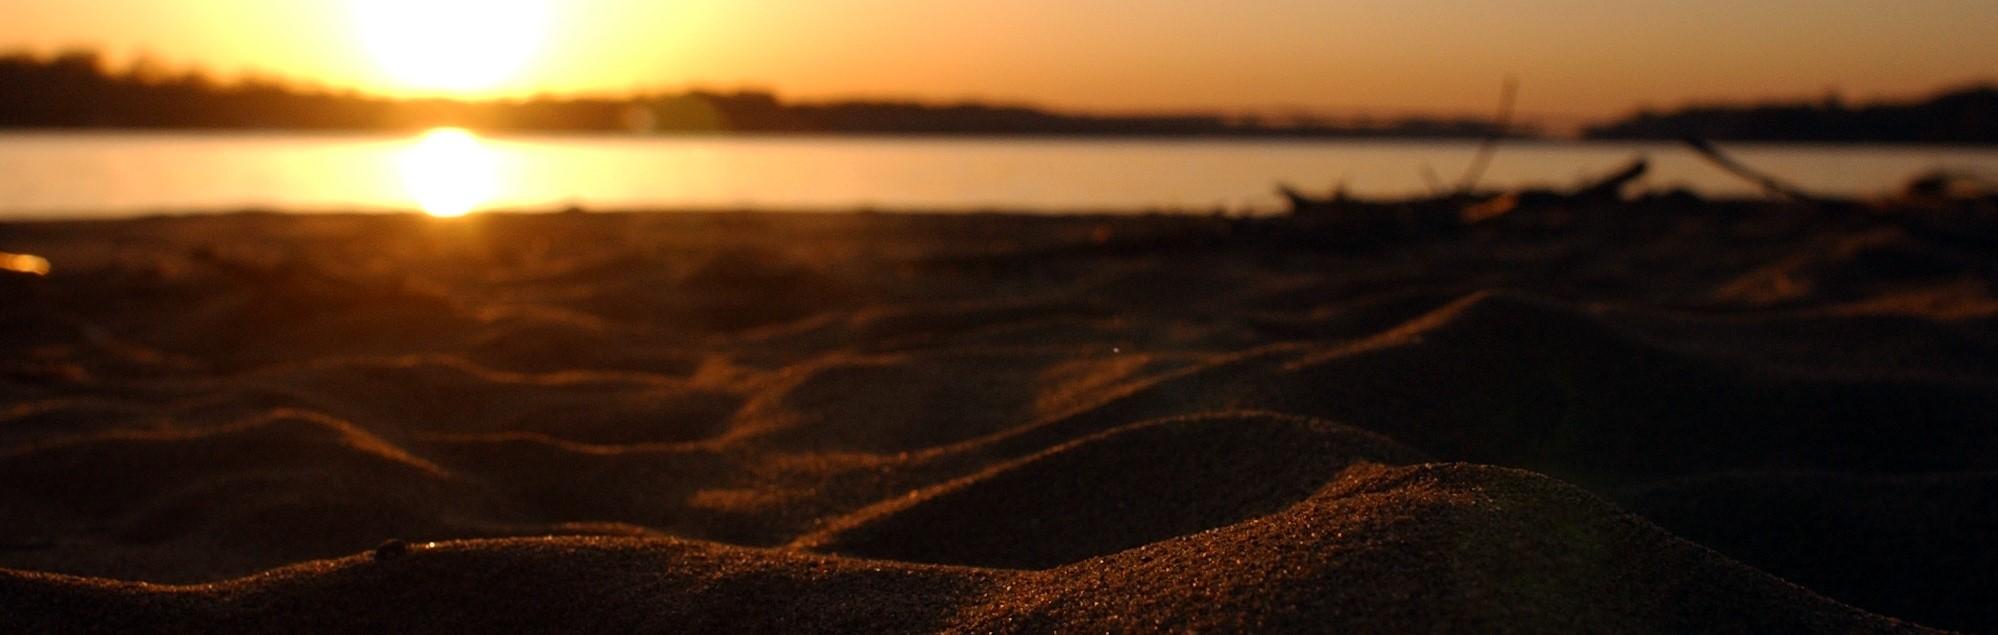 Sunset in Glen Burnie, Maryland - CarDonations4Cancer.org